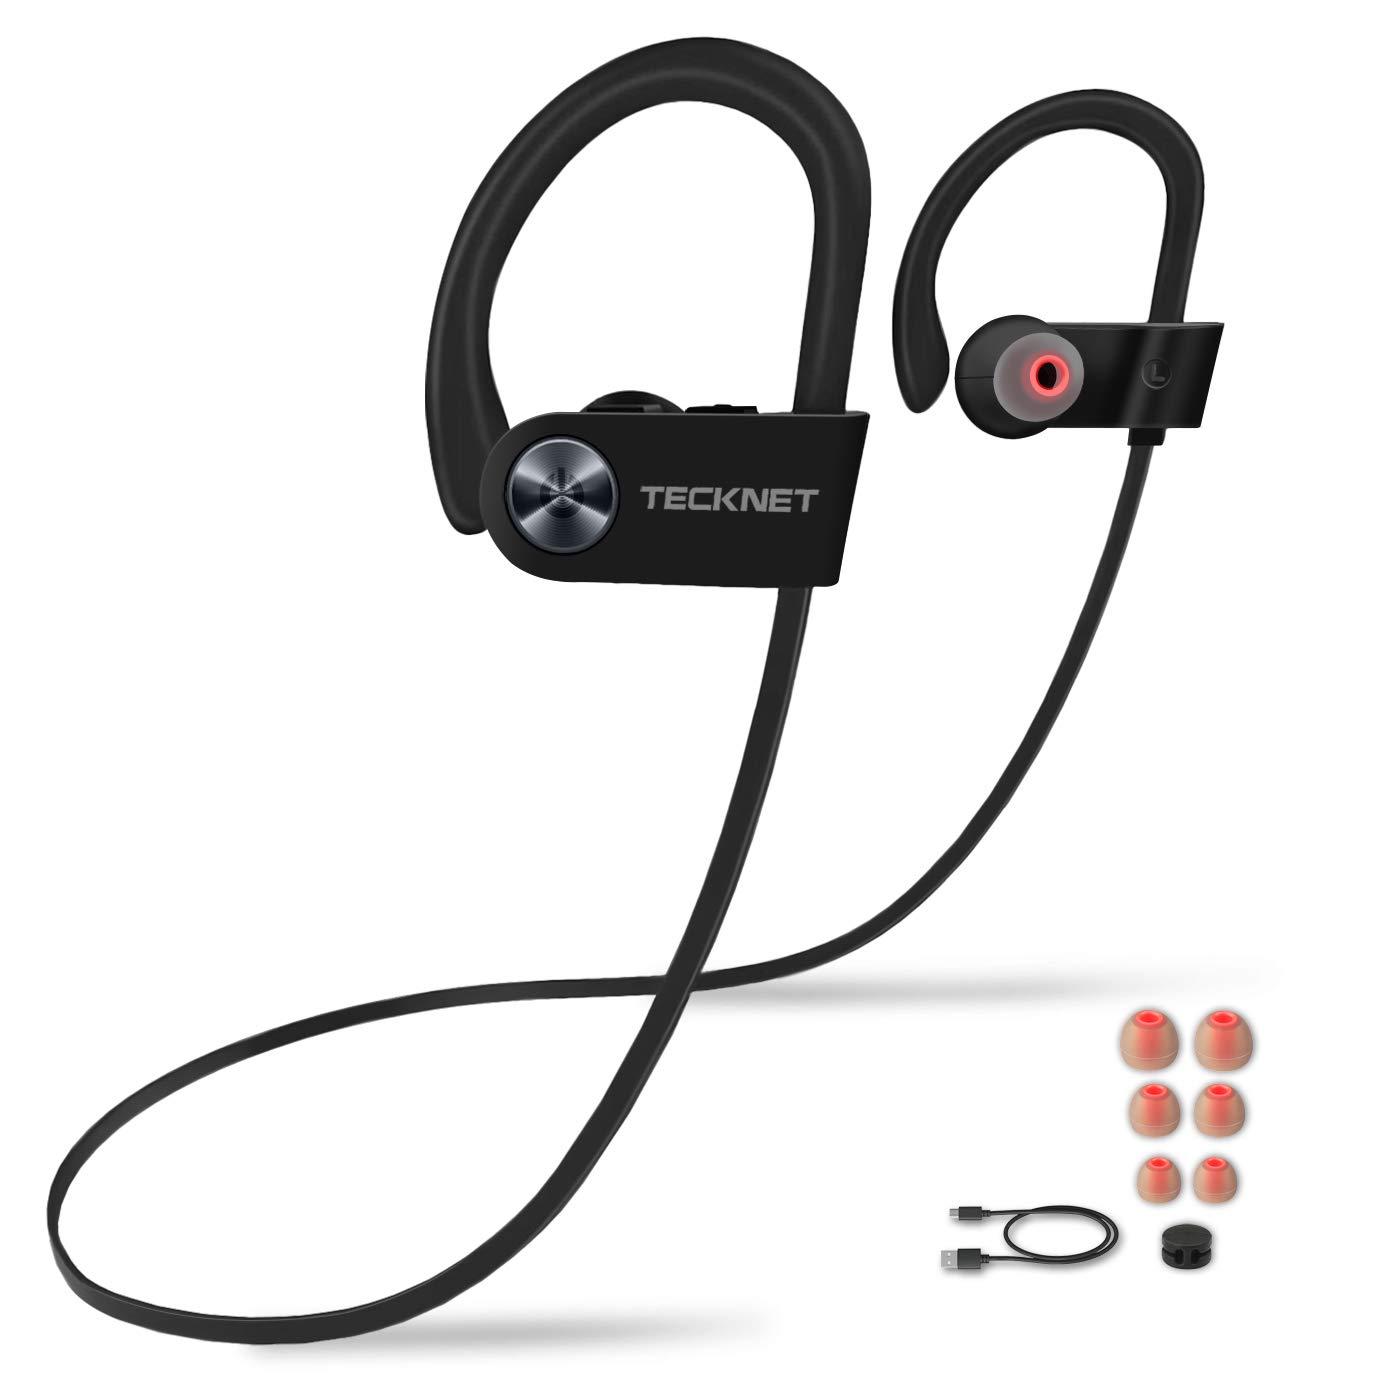 TeckNet Sports Headphones Wired